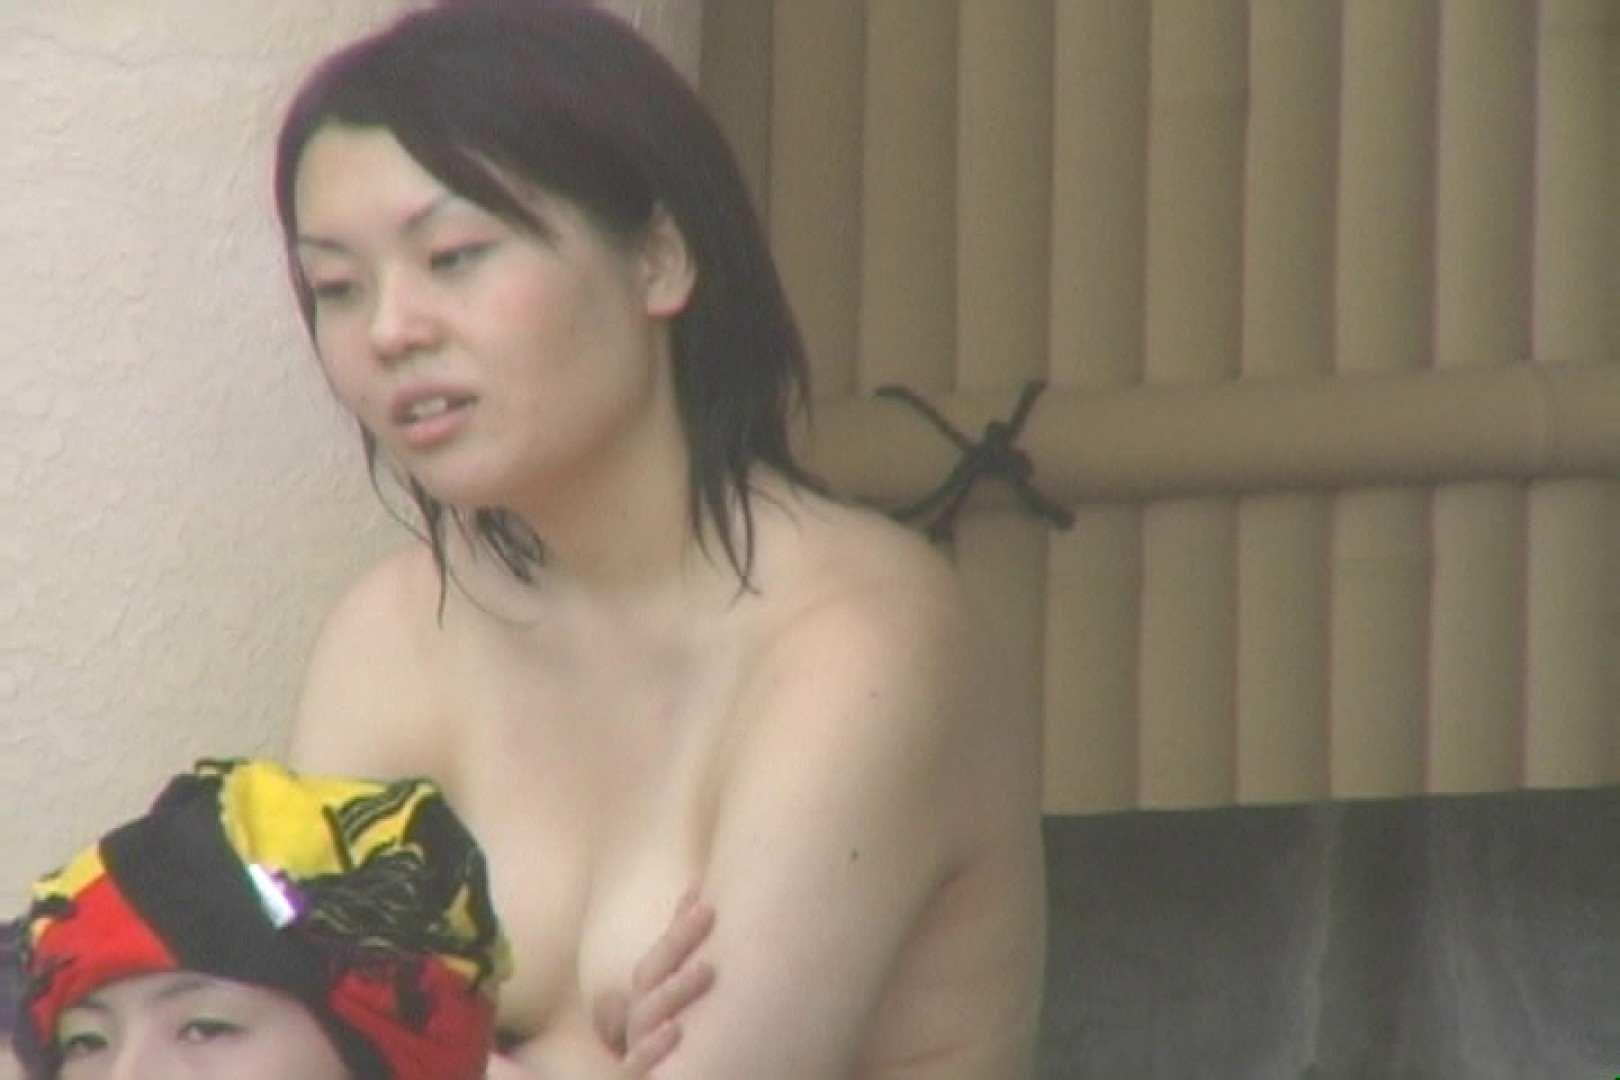 Aquaな露天風呂Vol.61【VIP限定】 露天 | OL女体  102連発 79